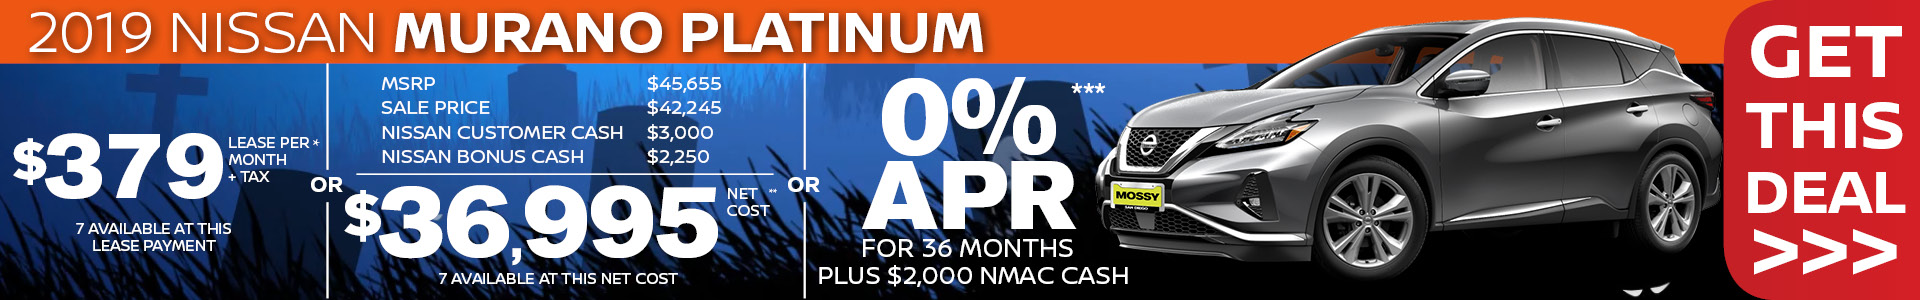 Mossy Nissan - Nissan Murano Platinum Purchase SRP